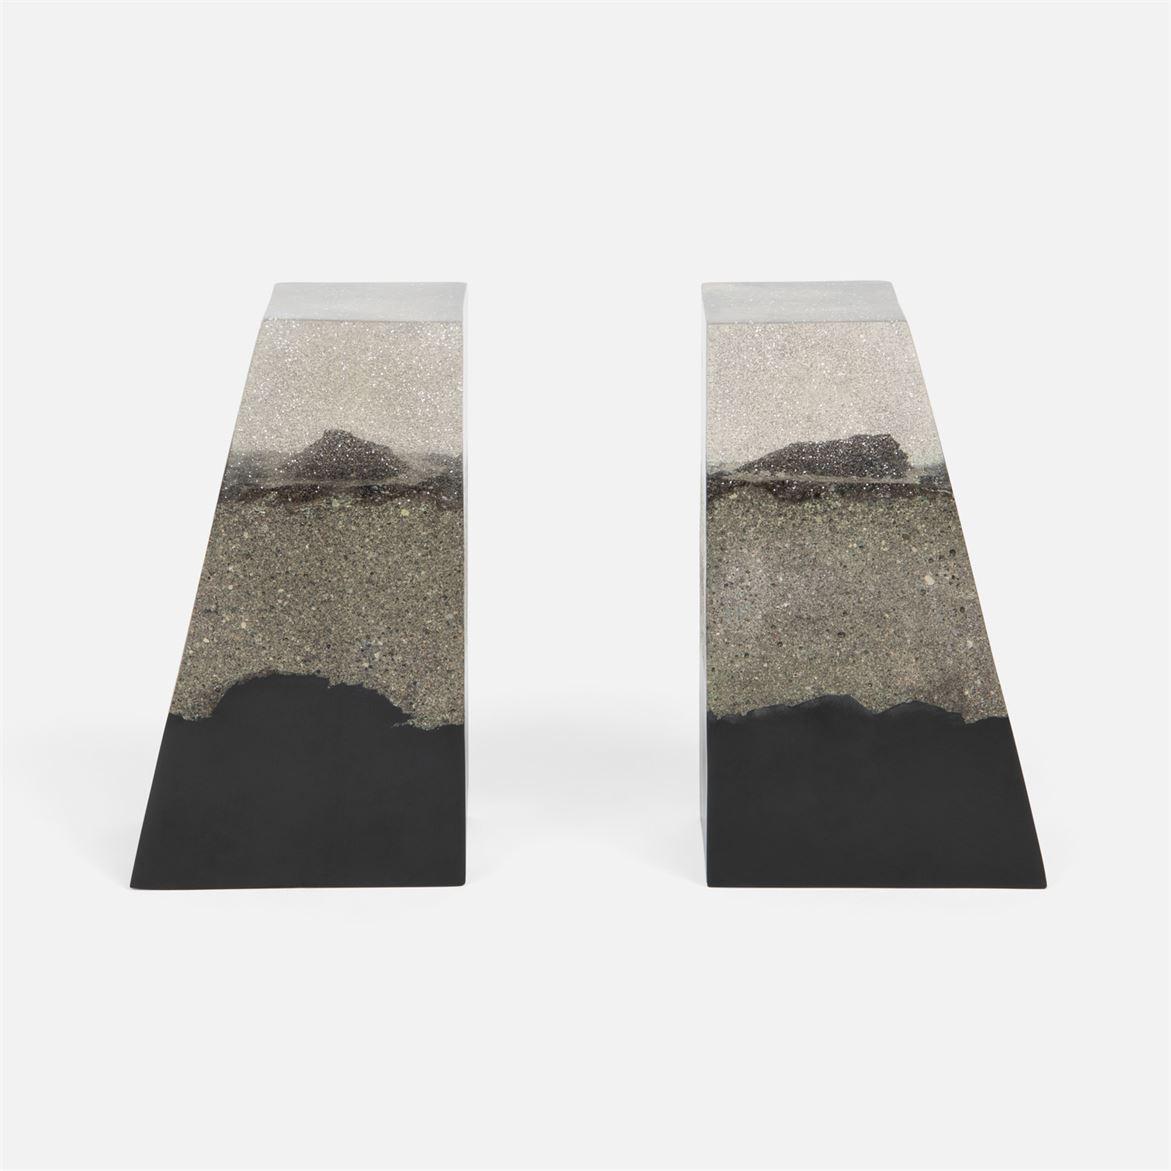 Capo Bookends | Grey & Black Sand